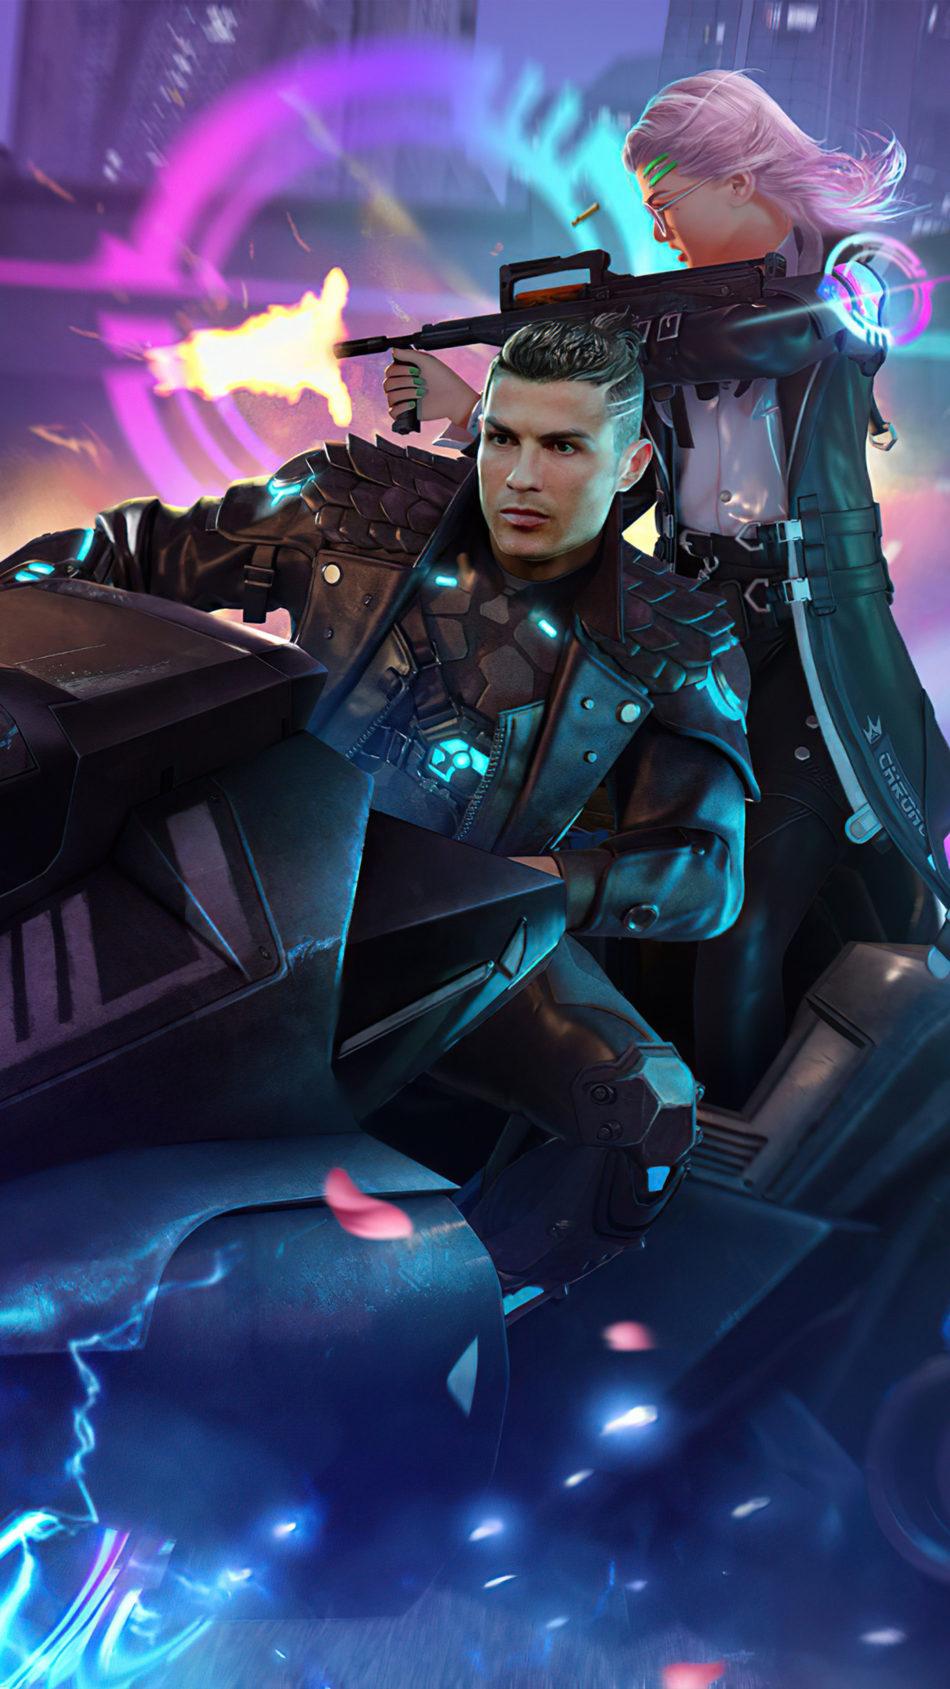 Cristiano Ronaldo Garena Free Fire Skin 4K Ultra HD Mobile Wallpaper